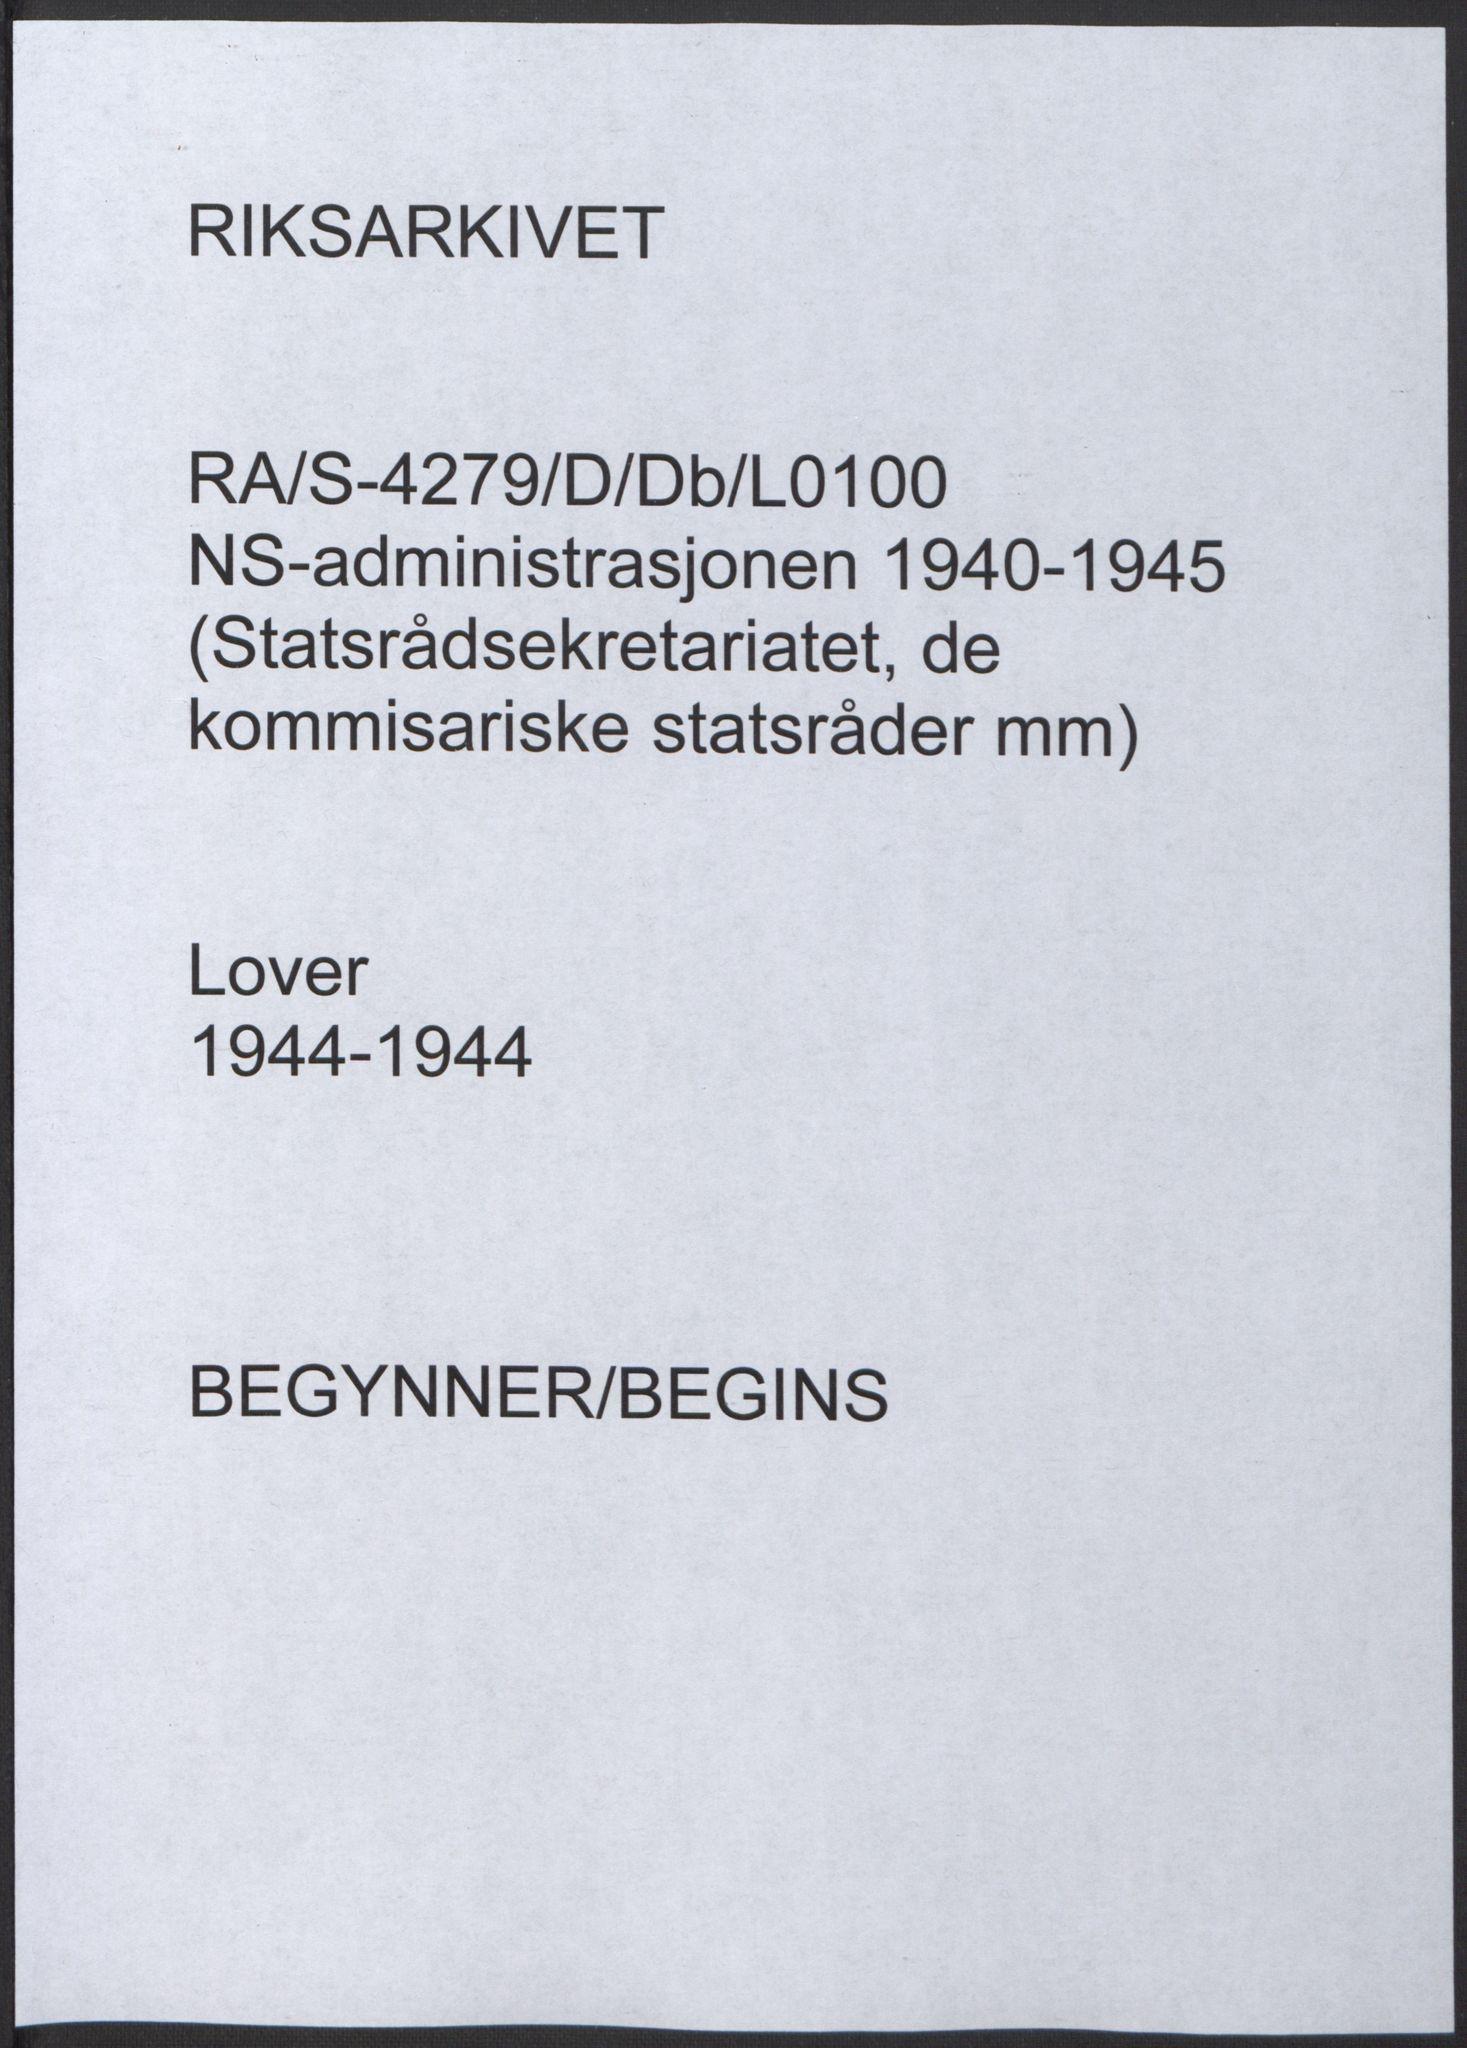 RA, NS-administrasjonen 1940-1945 (Statsrådsekretariatet, de kommisariske statsråder mm), D/Db/L0100: Lover, 1944, s. upaginert